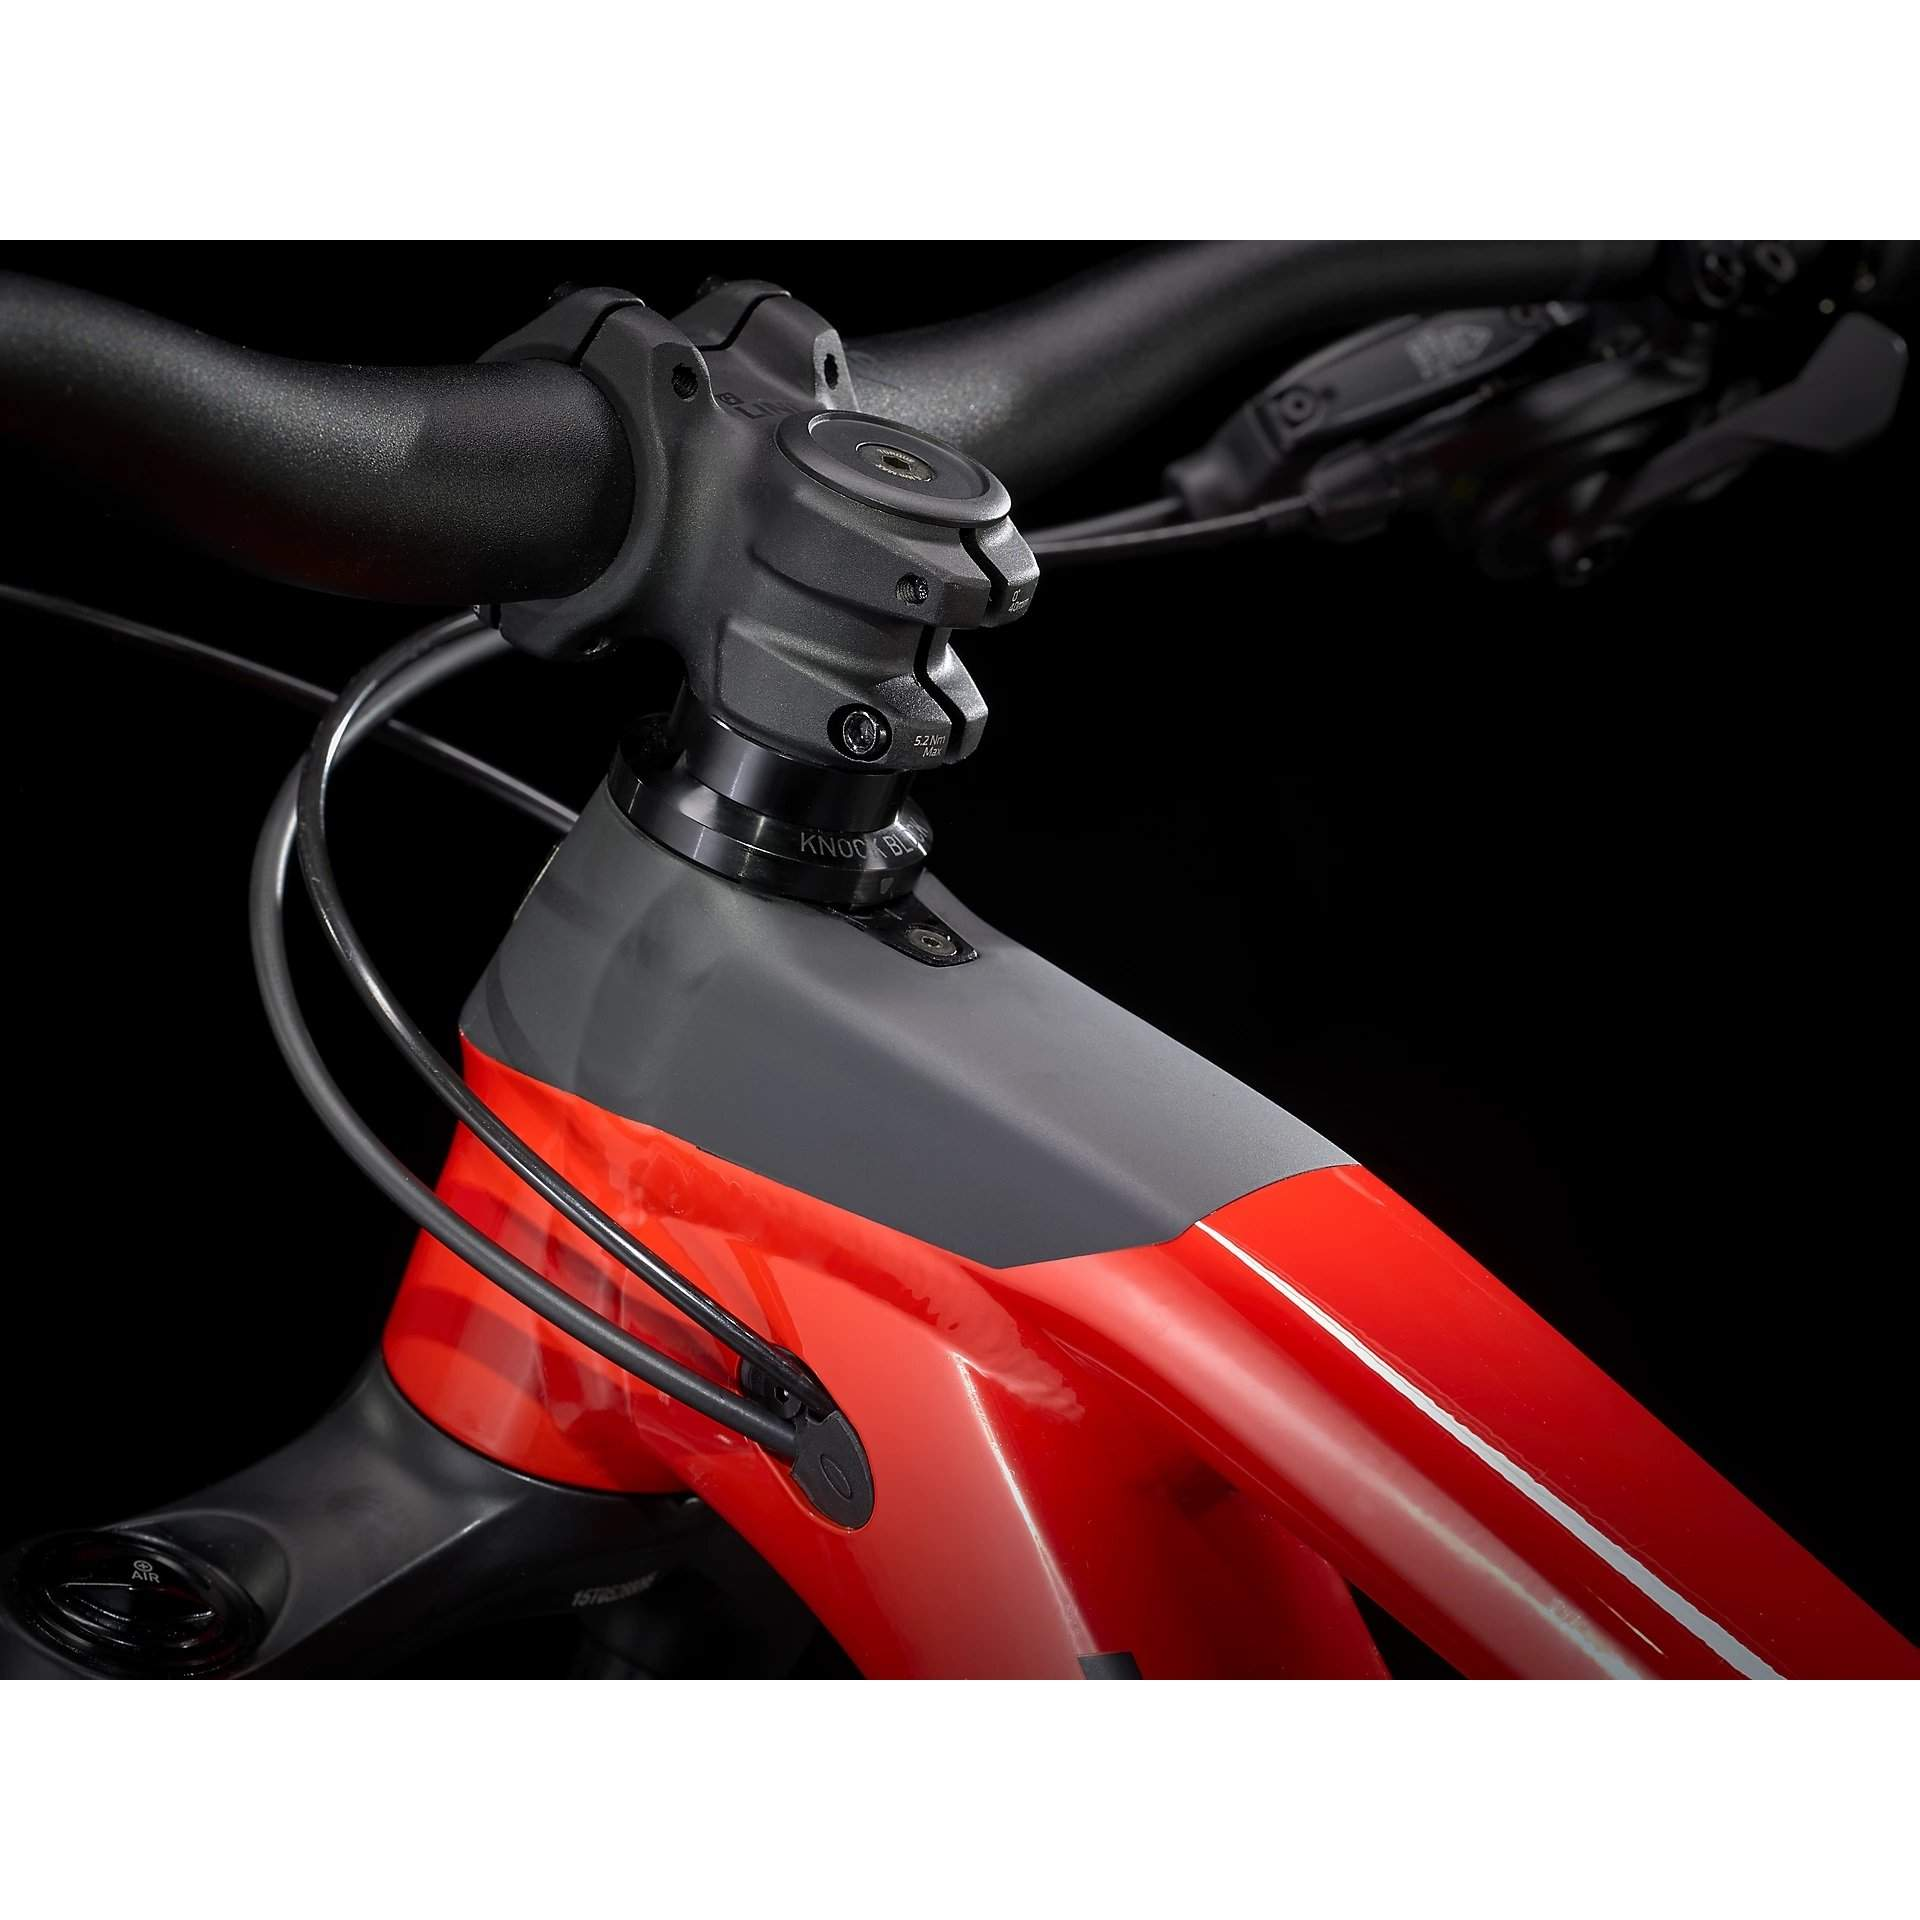 ROWER TREK SLASH 7 GLOSS RADIOACTIVE RED|MATTE BLACK 8